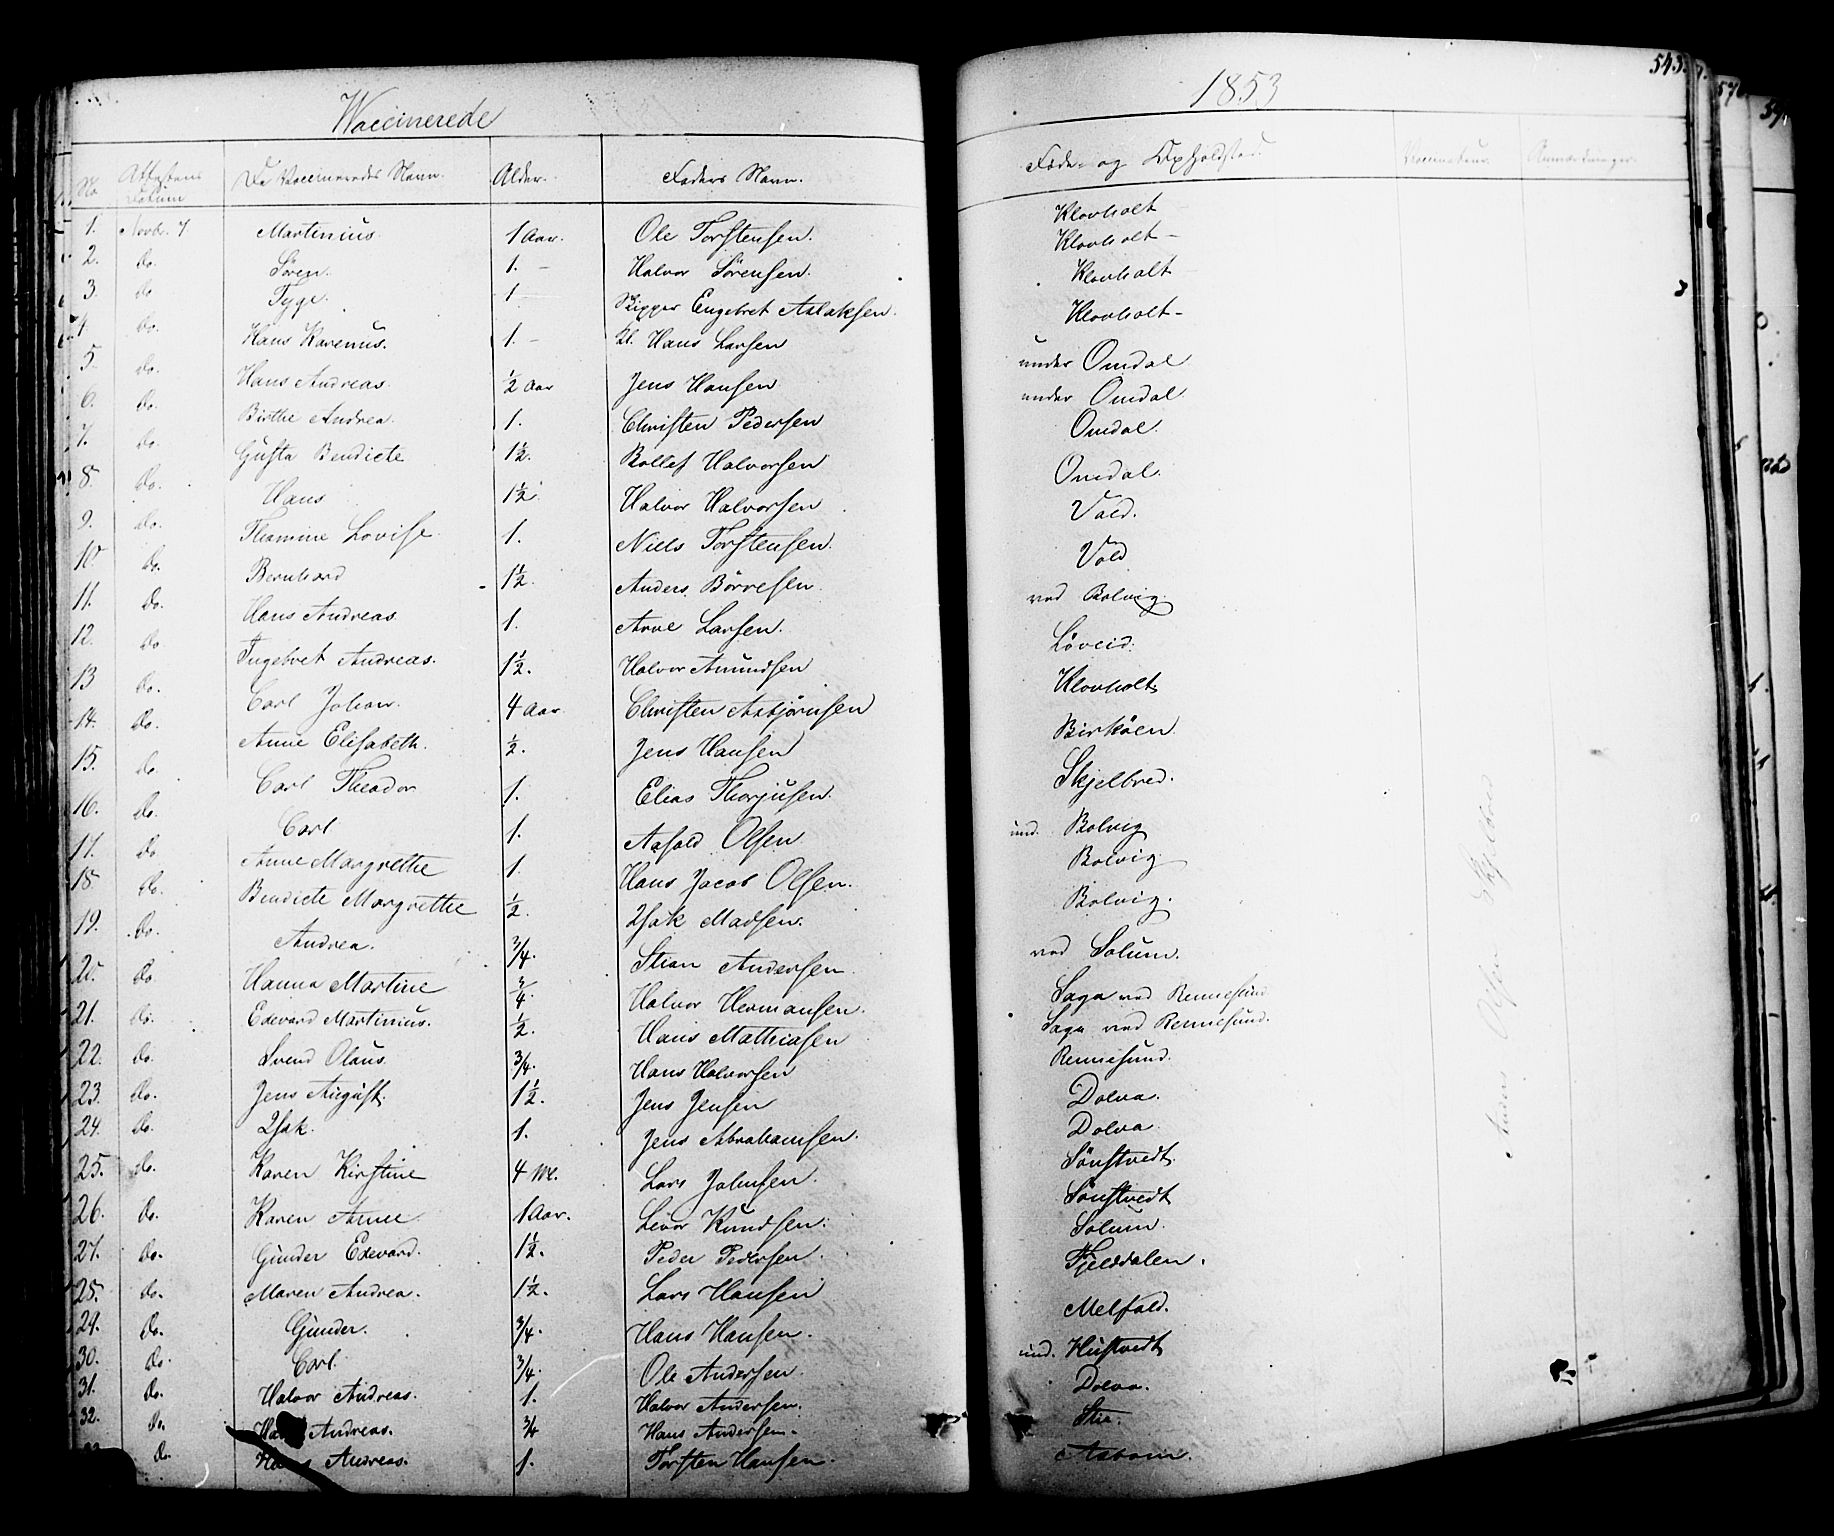 SAKO, Solum kirkebøker, F/Fa/L0006: Ministerialbok nr. I 6, 1844-1855, s. 543